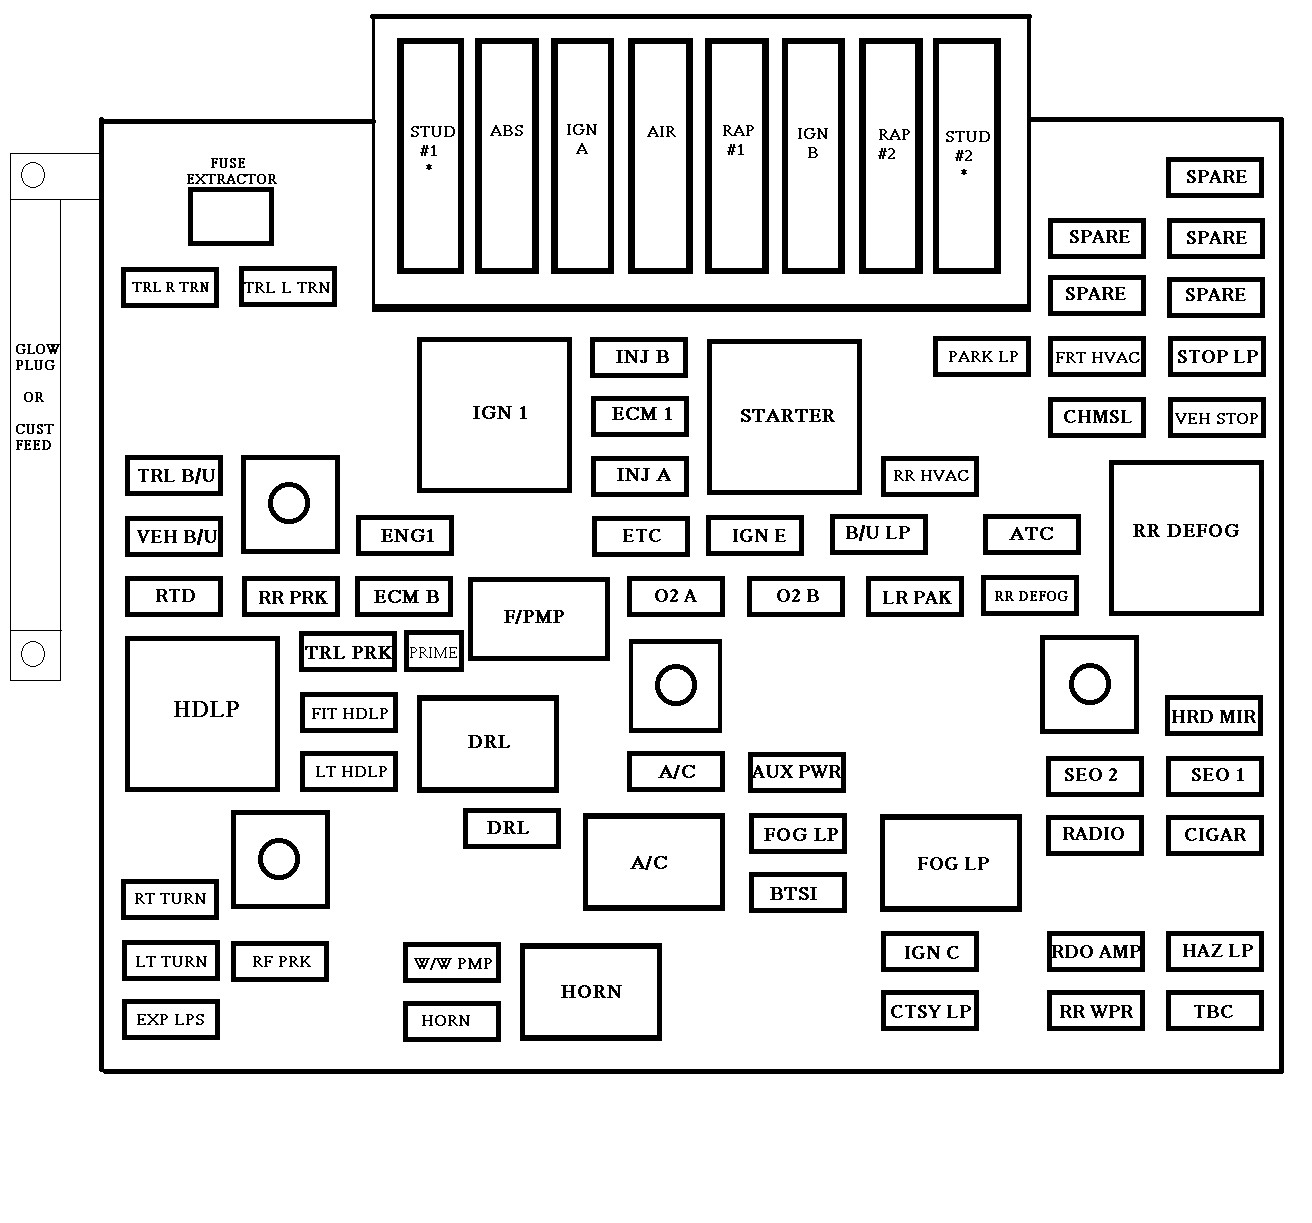 Roger Vivi Ersaks Chevy Equinox Wiring Diagram